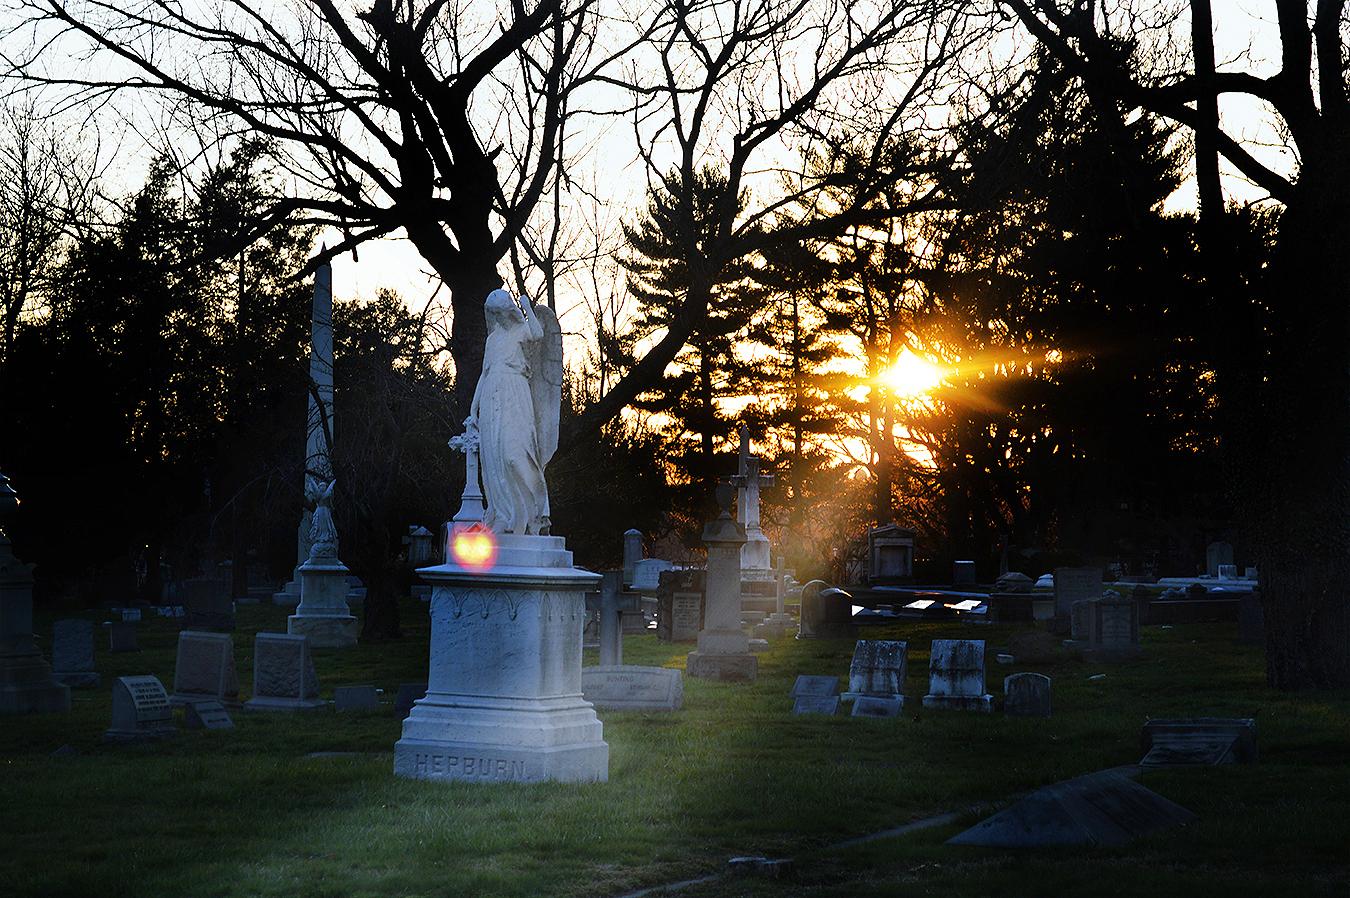 Woodlands_Cemetery_Gravestones_Angel_Sunset_Dusk_Flare_Shadow_Philadelphia_PA